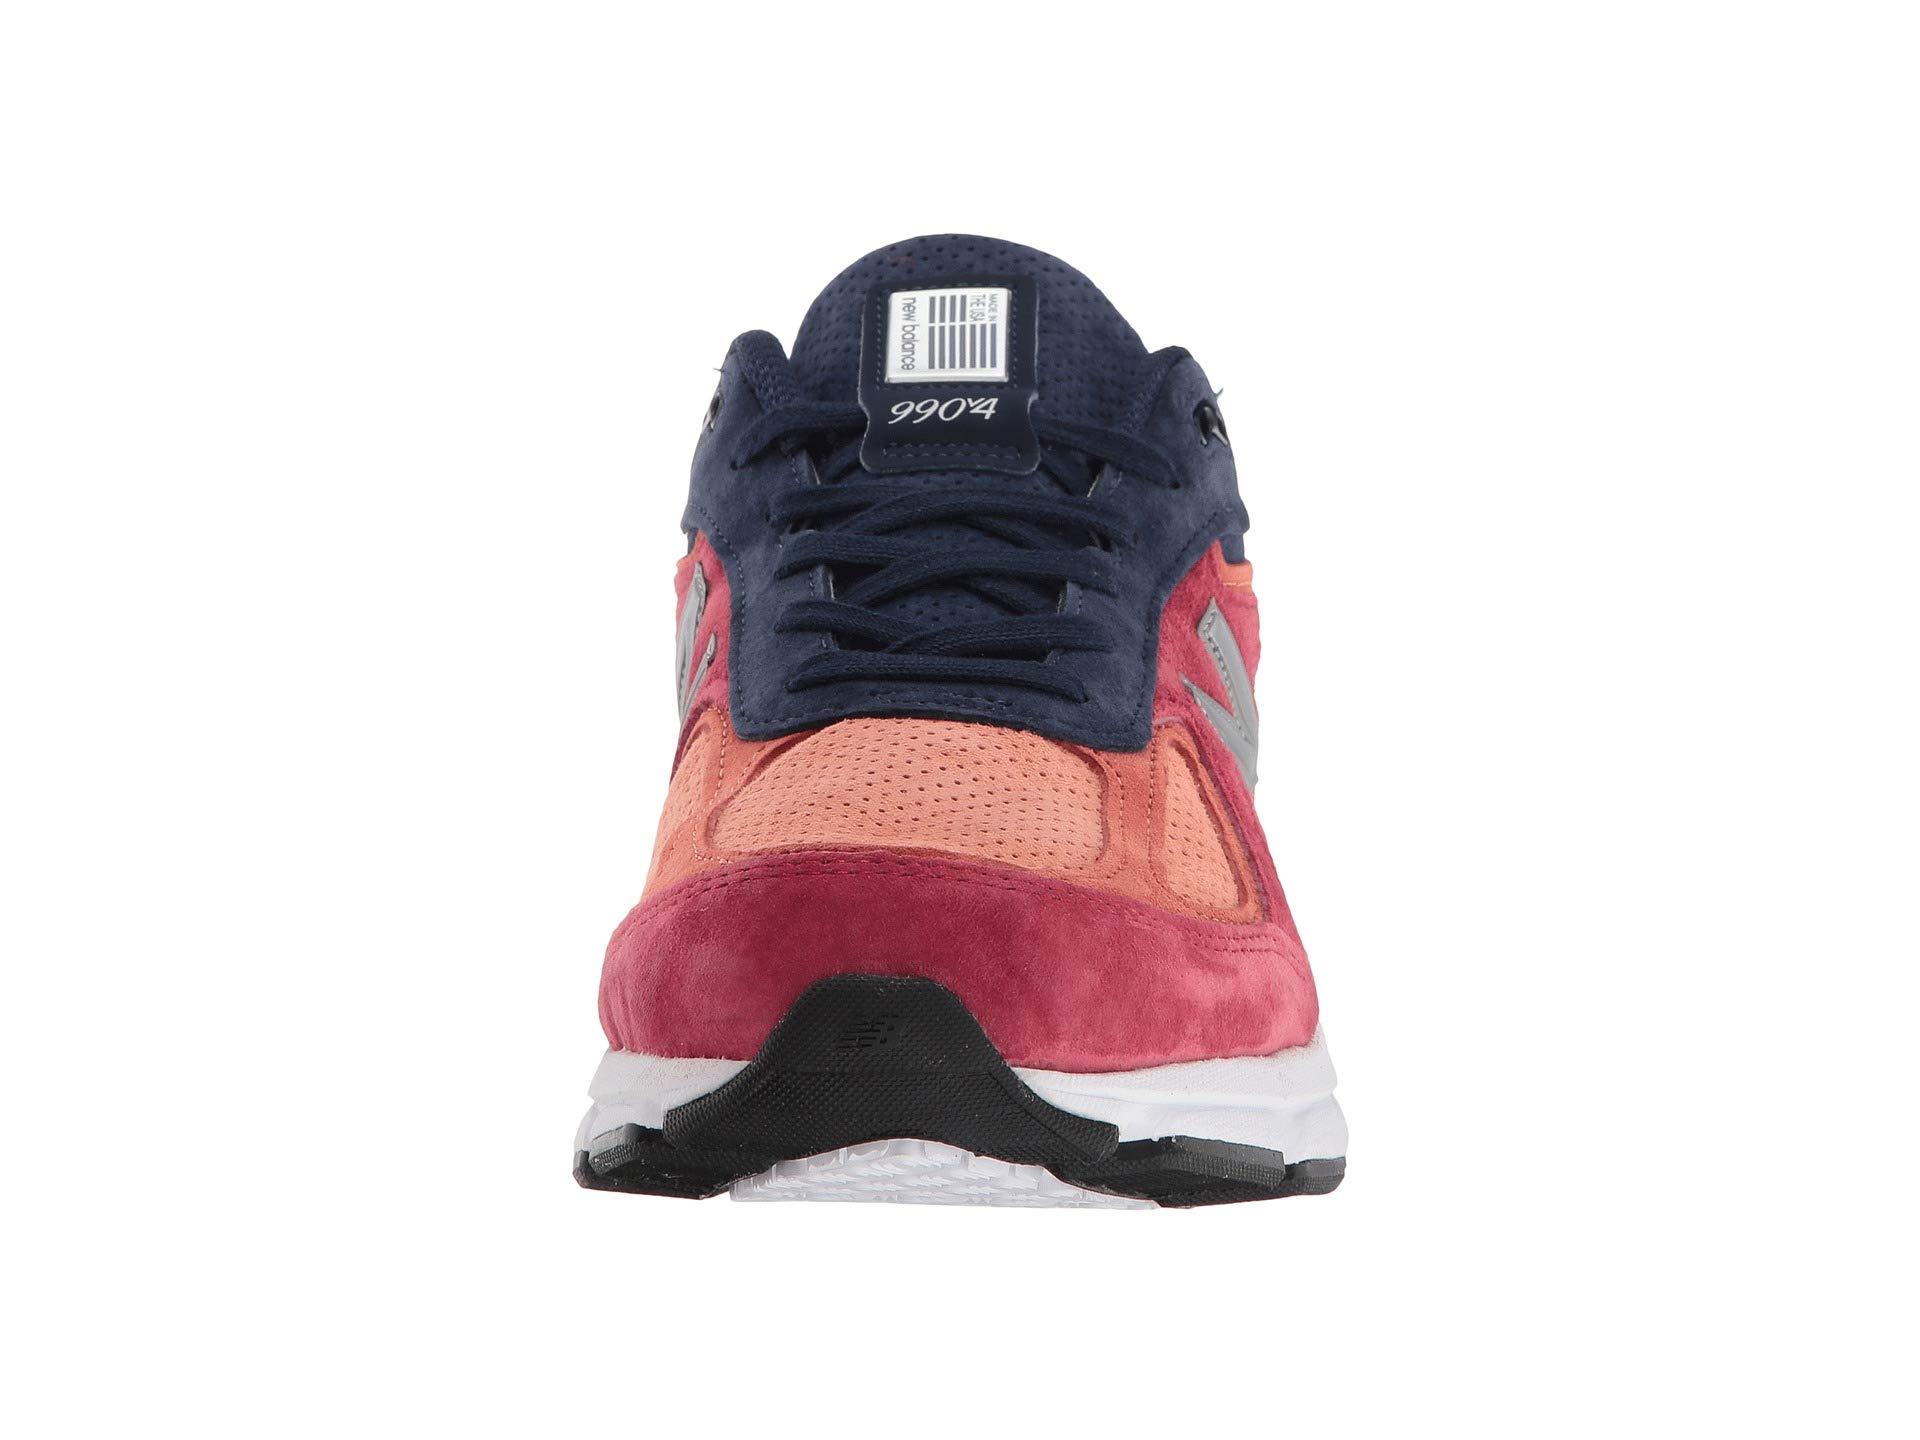 New Balance pigment M990v4 Rose Copper rAr6wqxF